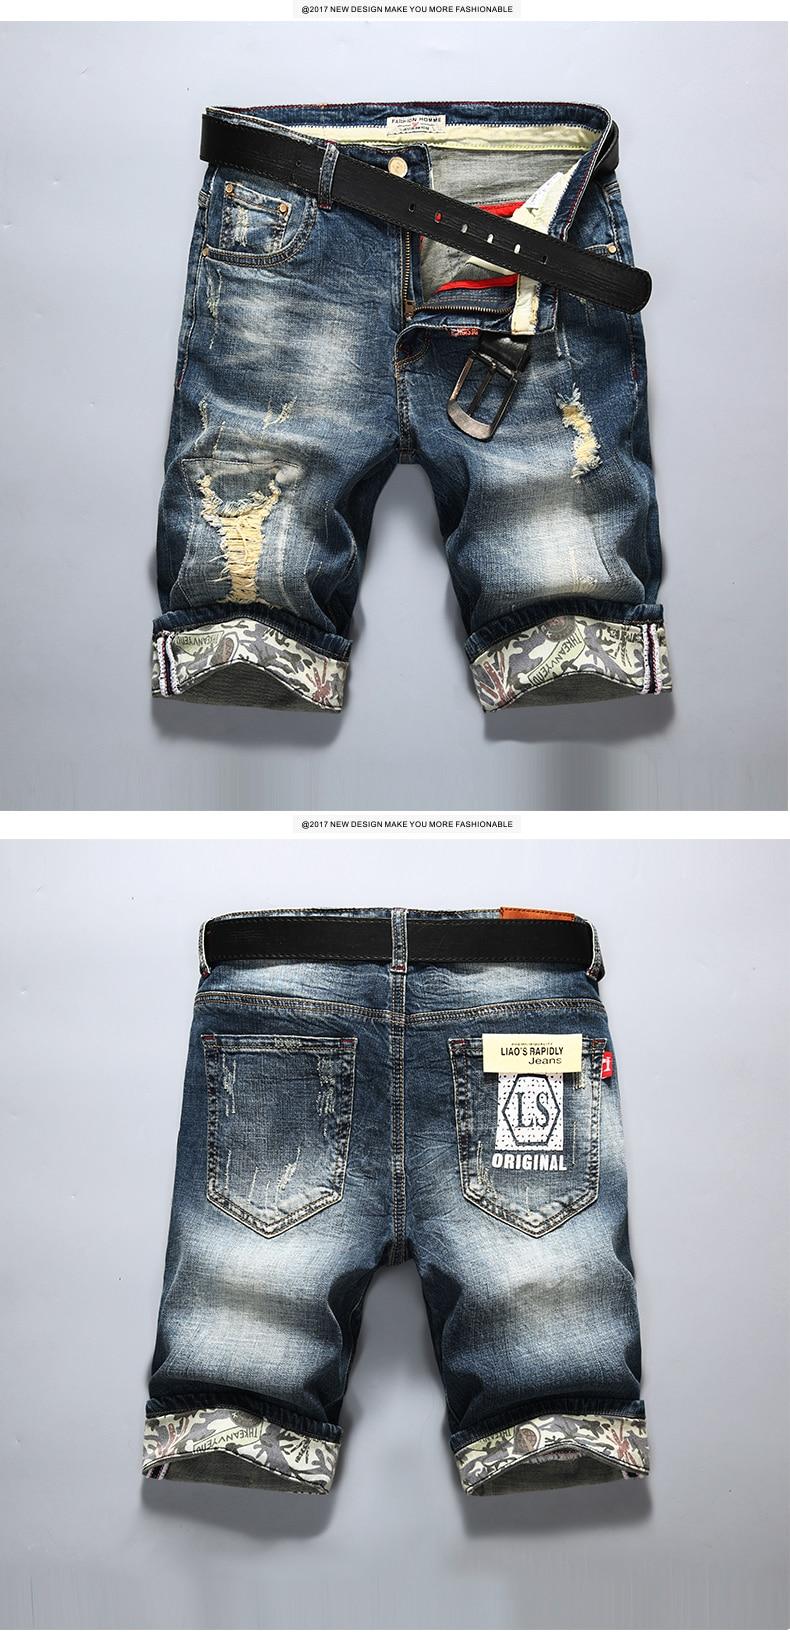 HTB15XoLQVXXXXXwXpXXq6xXFXXXK - AIRGRACIAS New Fashion Mens Ripped Short Jeans Brand Clothing Bermuda Summer 98% Cotton Shorts Breathable Denim Shorts Male